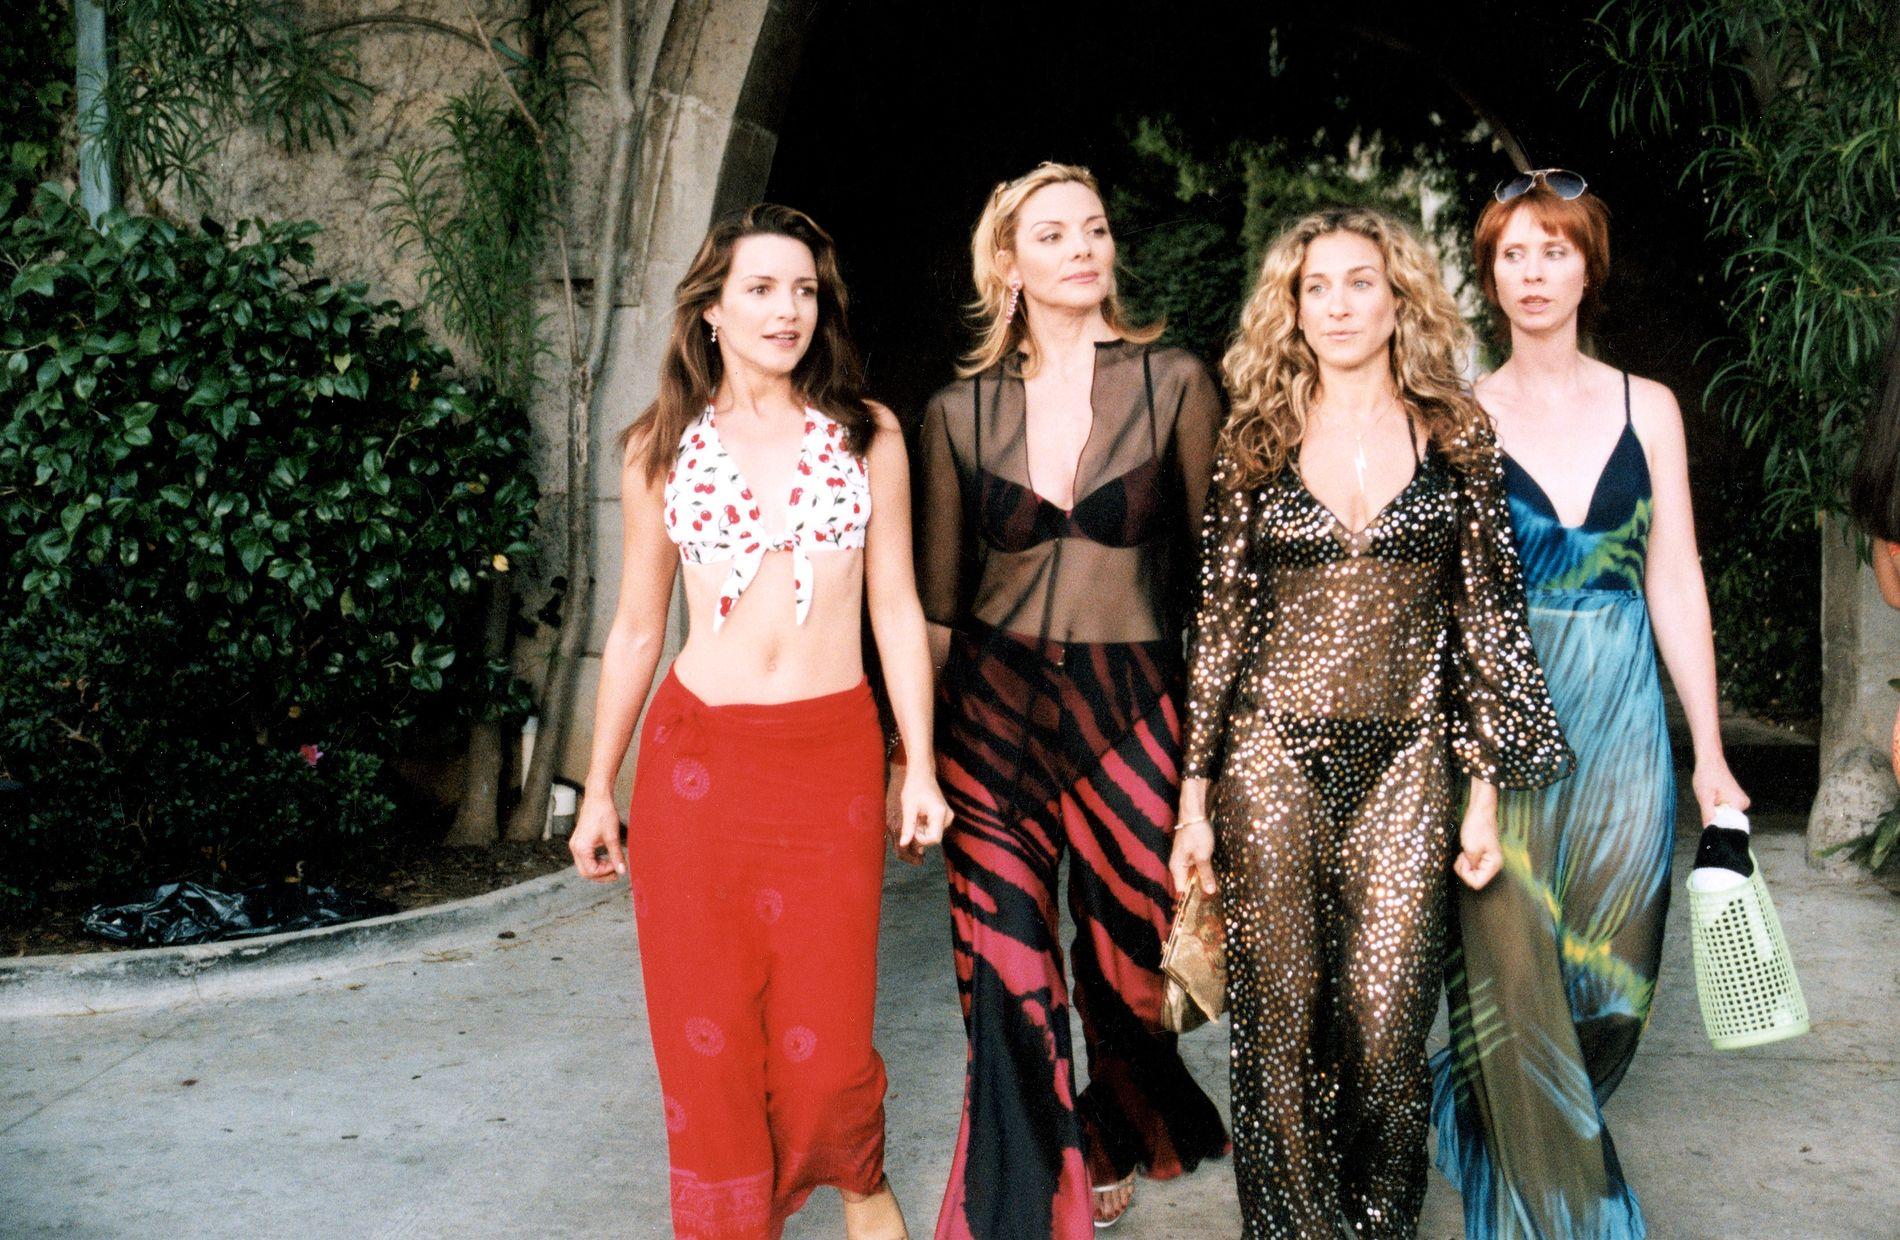 GJENGEN: . Kristin Davis som Charlotte, Kim Cattrall som Samantha, Sarah Jessica Parker som Carrie Bradshaw og Cynthia Nixon som Miranda i «Sex og singelliv».